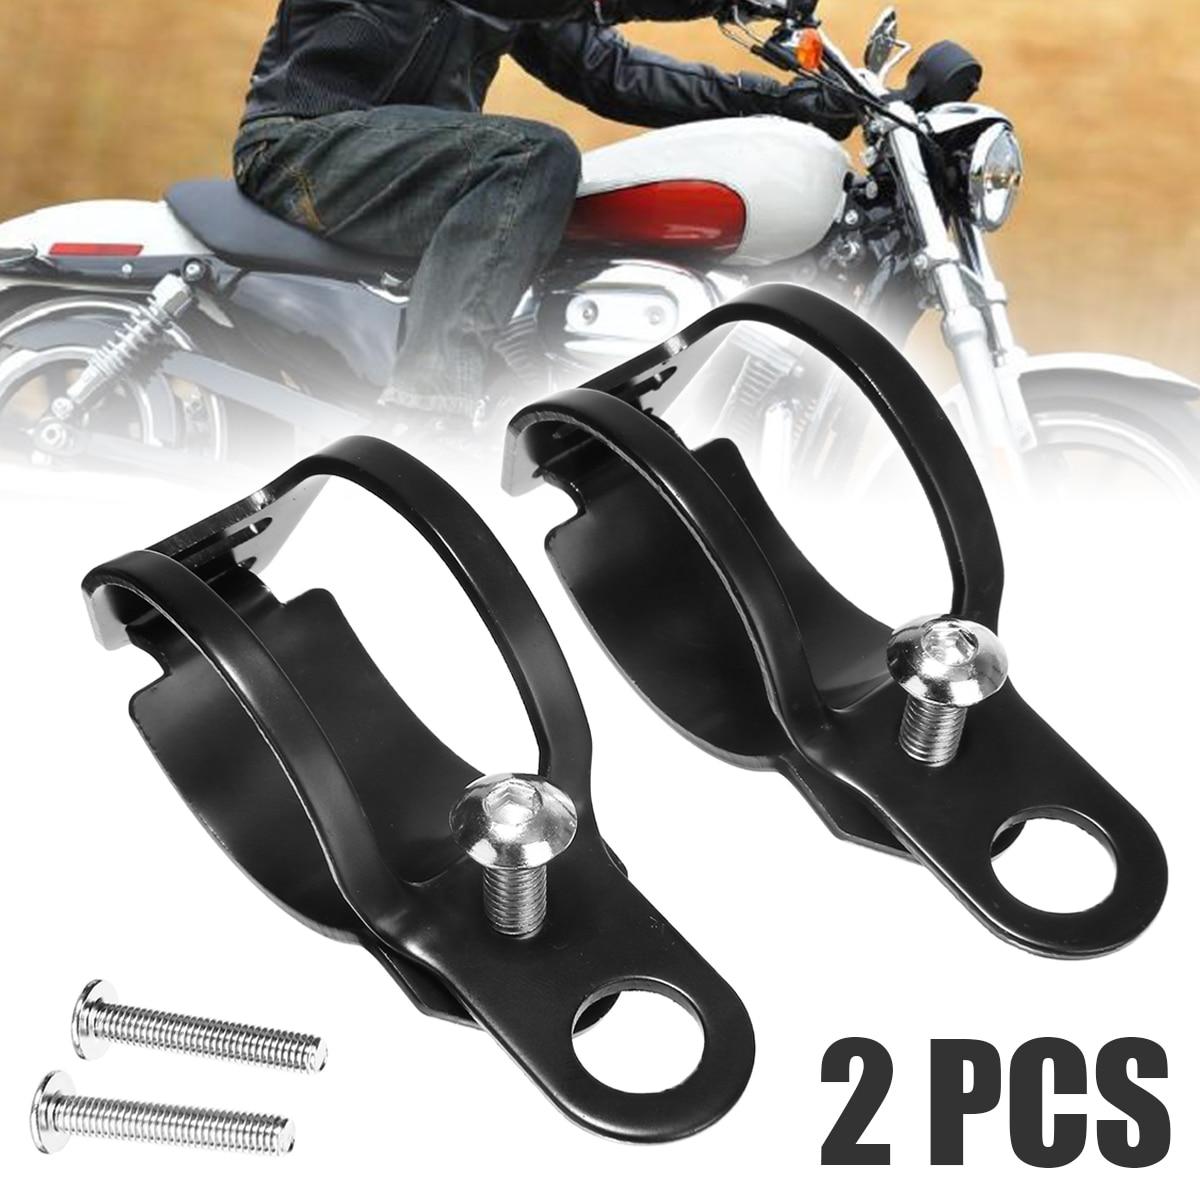 Motorbike 1Pair Universal Motorcycle Turn Signal Lamp Headlight Mount Bracket Black Metal  Clamp Holder For 33-43mm Front Fork